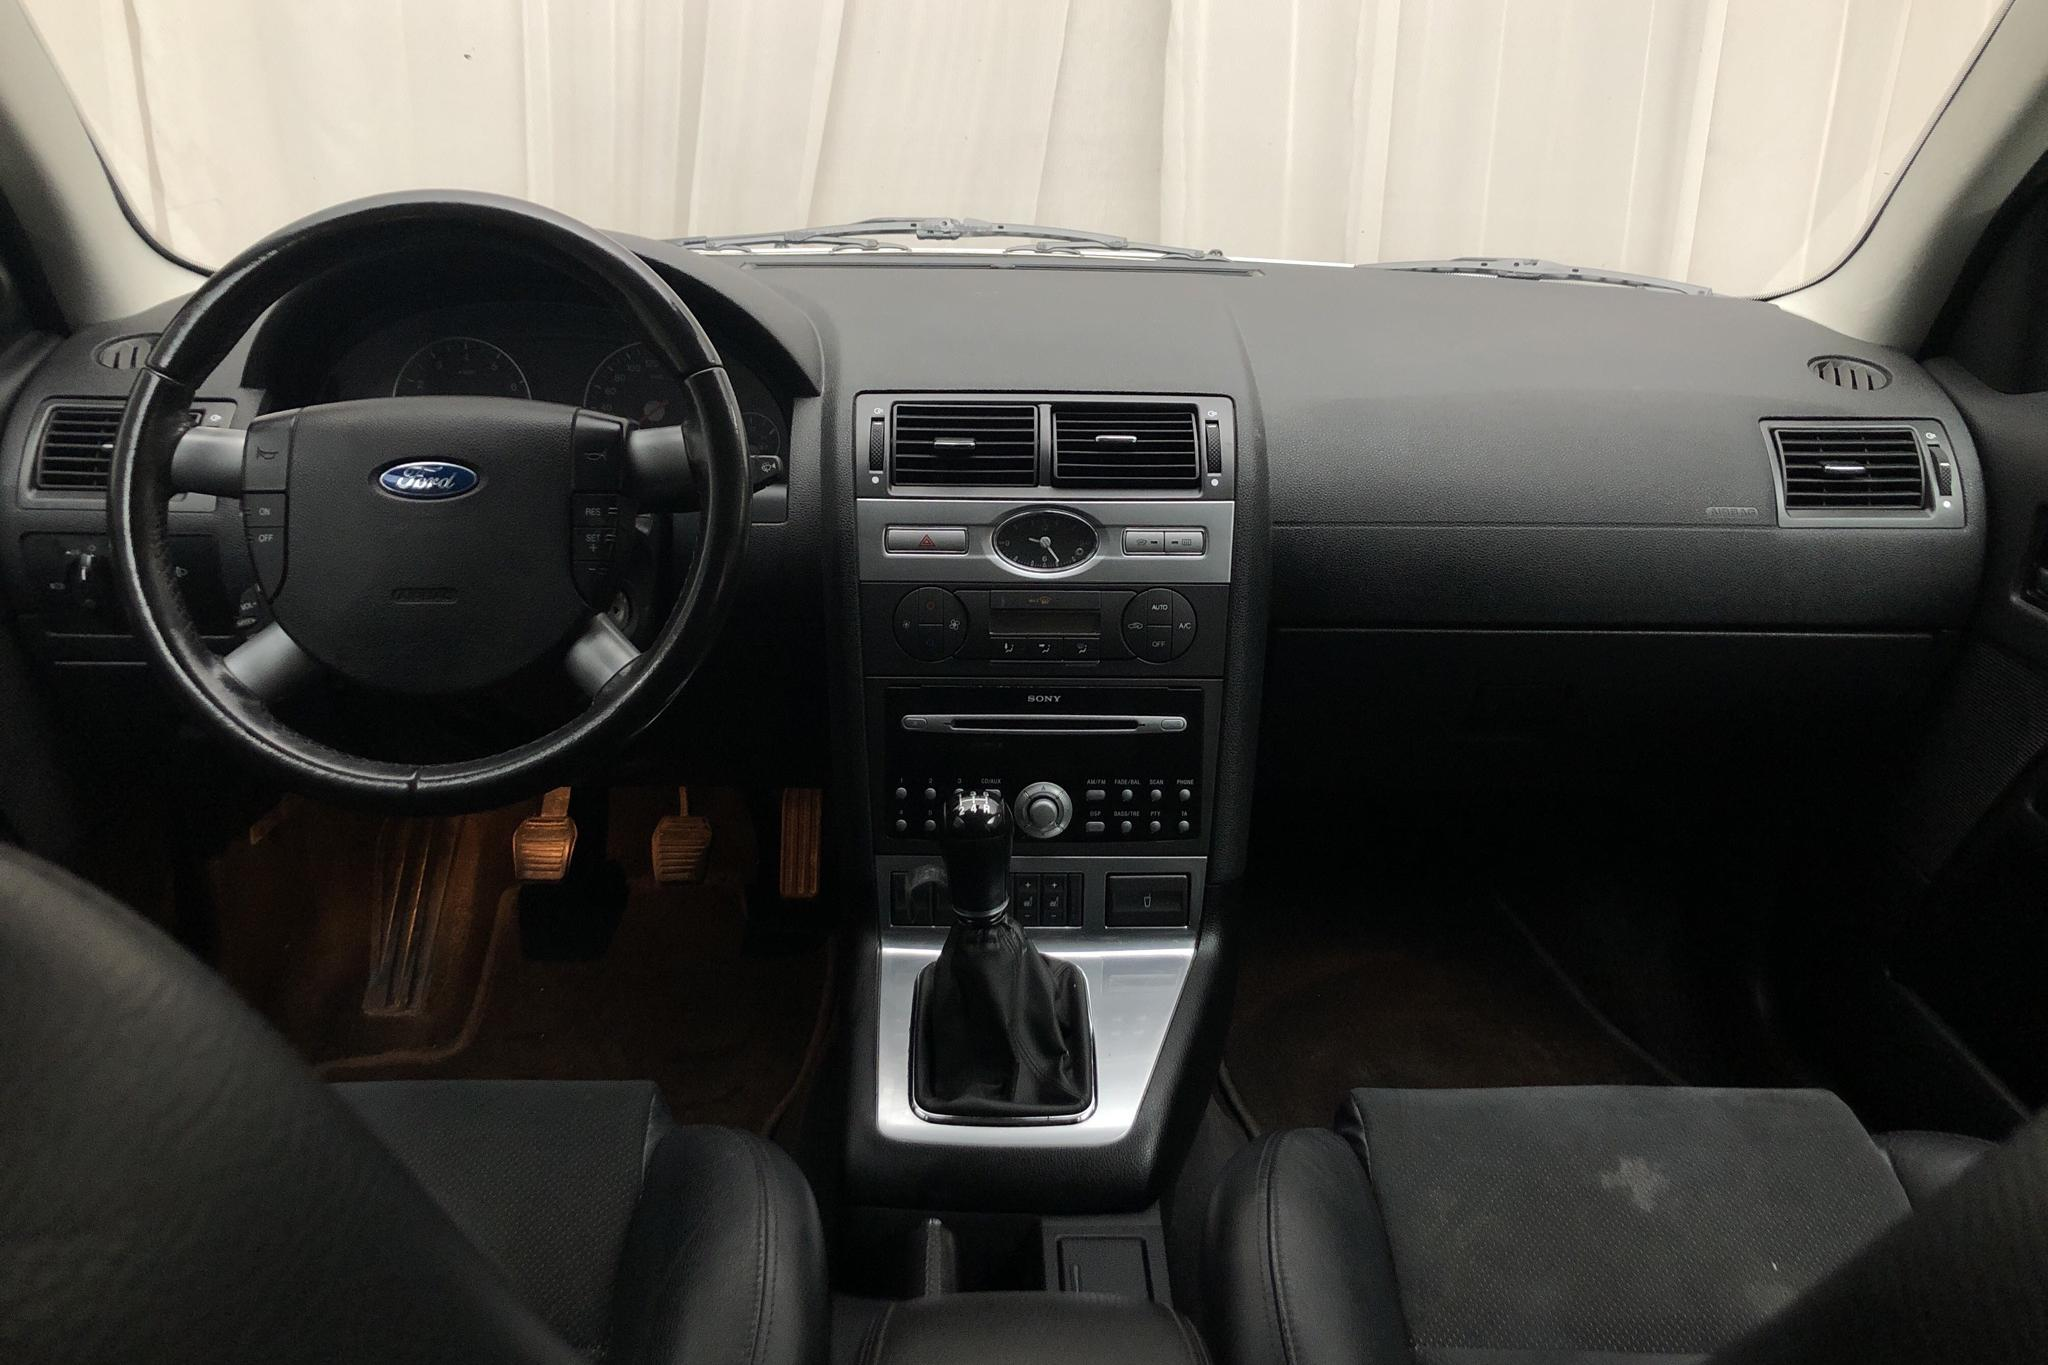 Ford Mondeo 2.0 Kombi (145hk) - 21 023 mil - Manuell - grå - 2007